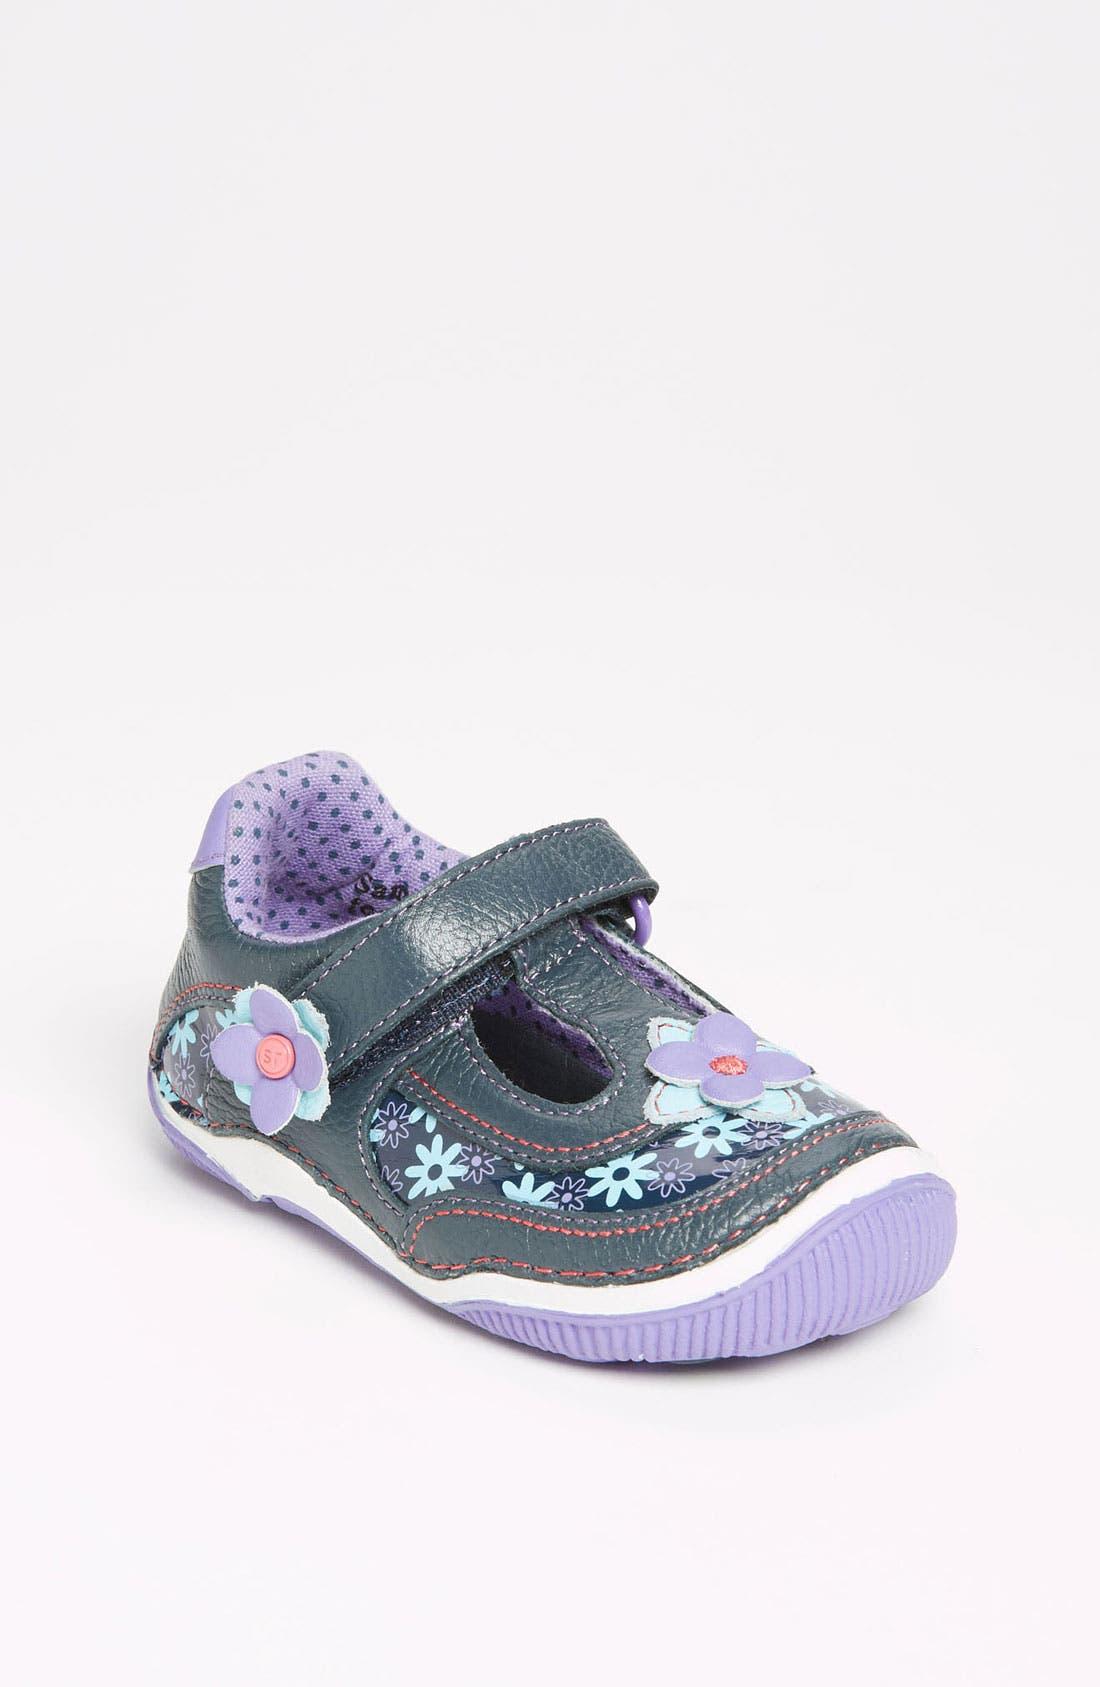 Main Image - Stride Rite 'Rain' Sneaker (Baby, Walker & Toddler)